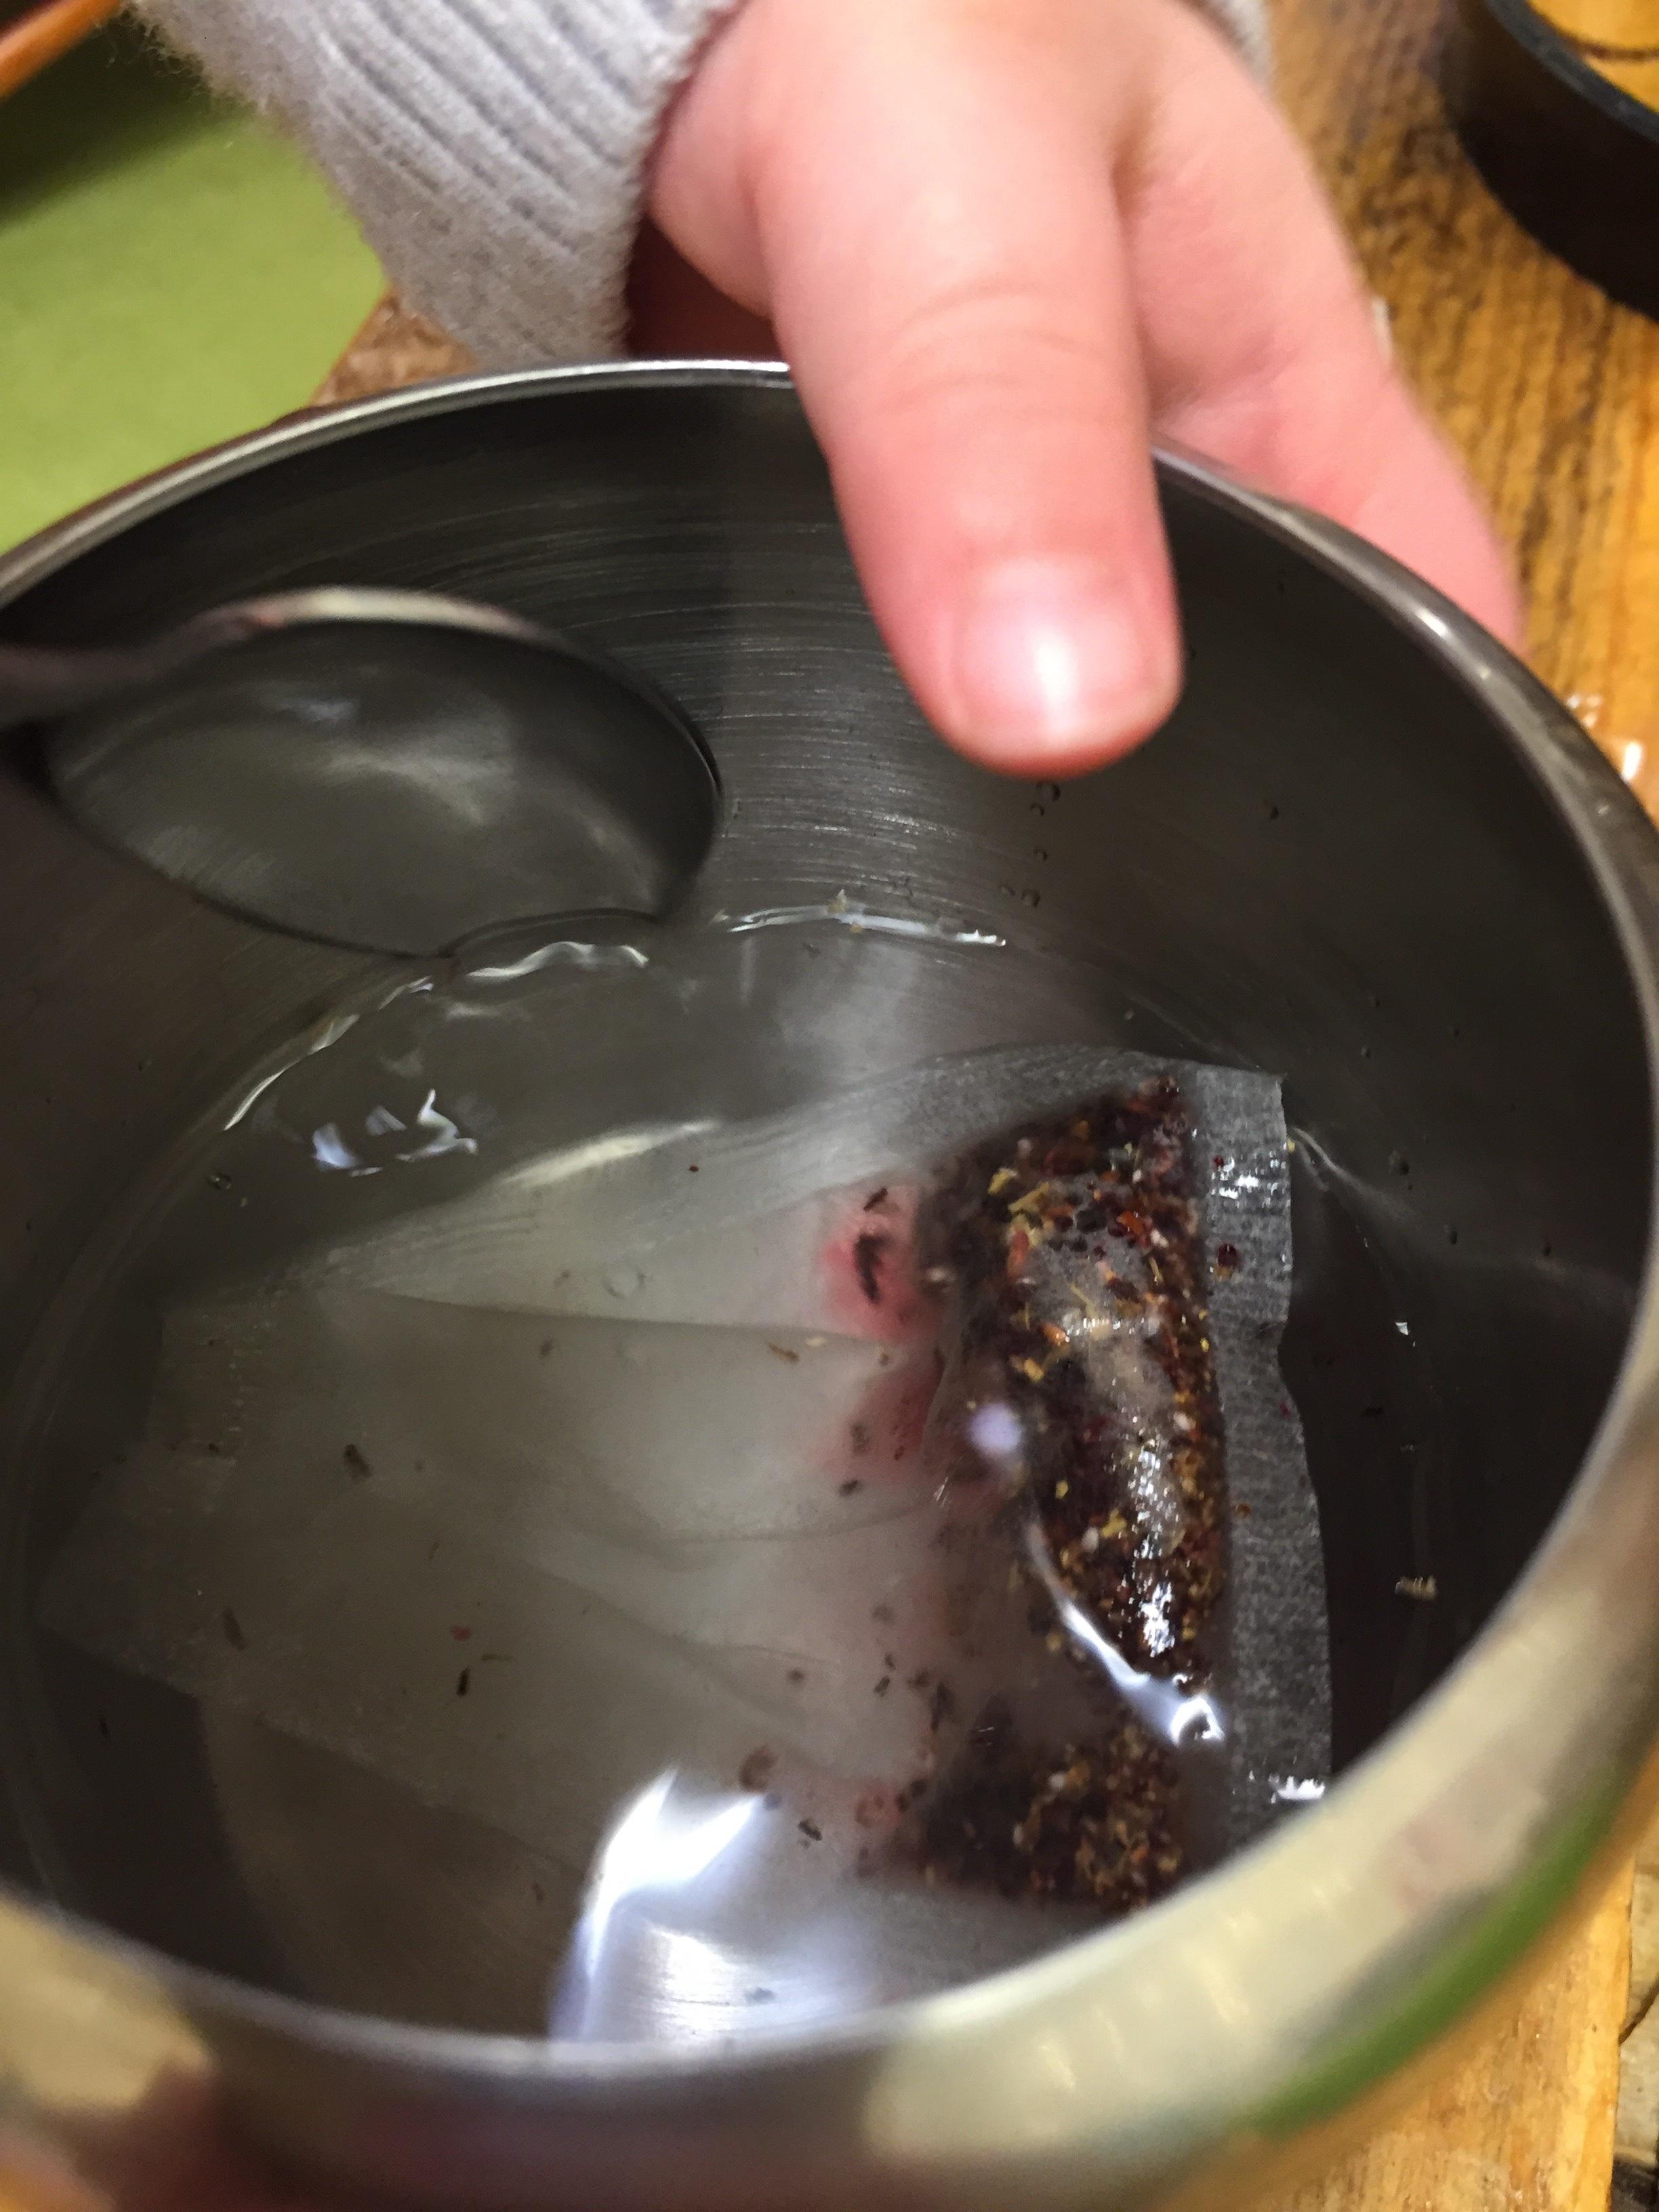 Stirring-the-tea